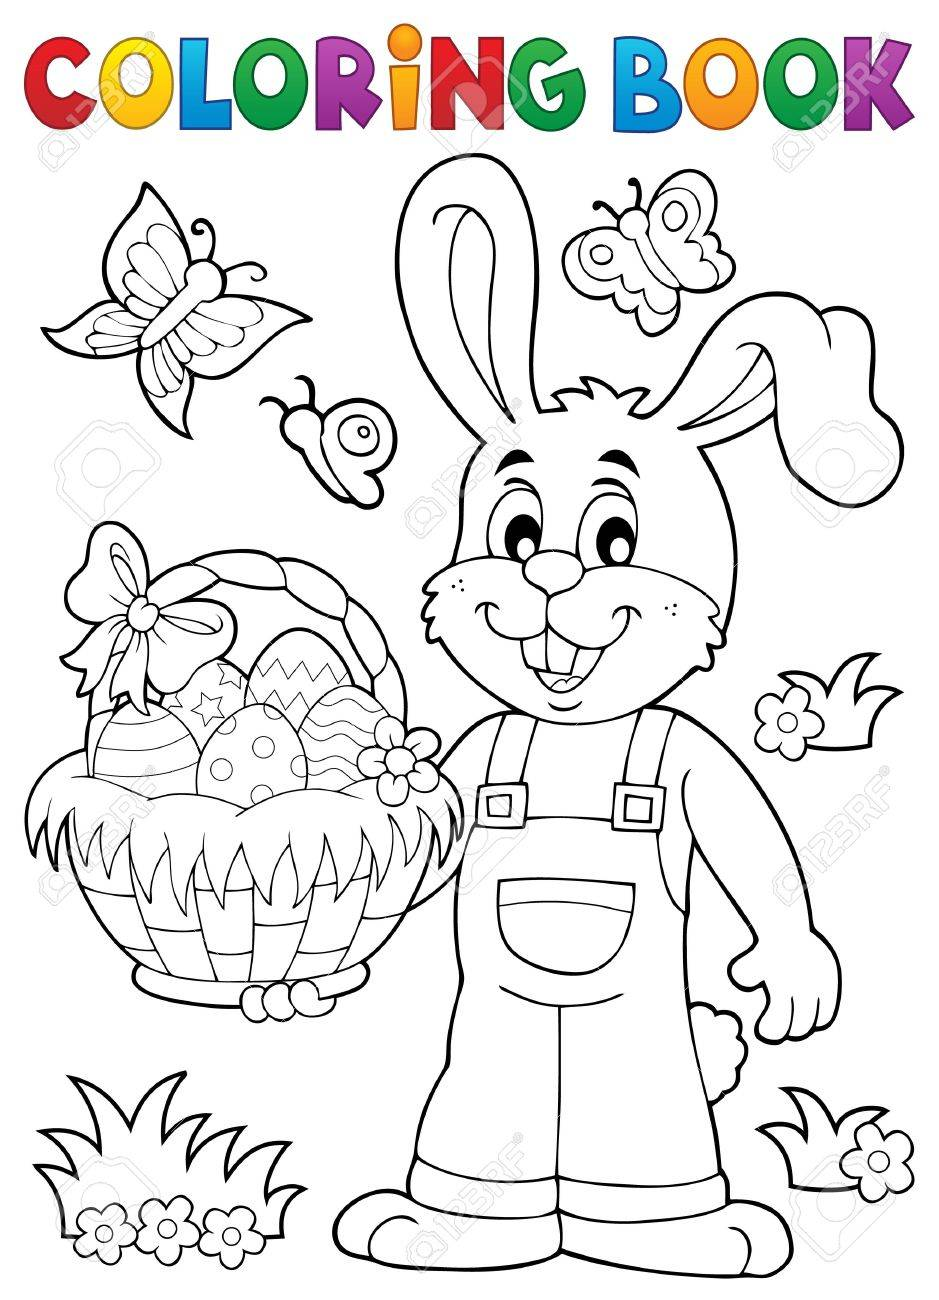 Libro Para Colorear Conejo De Pascua Tema 7 - Ilustración Vectorial ...